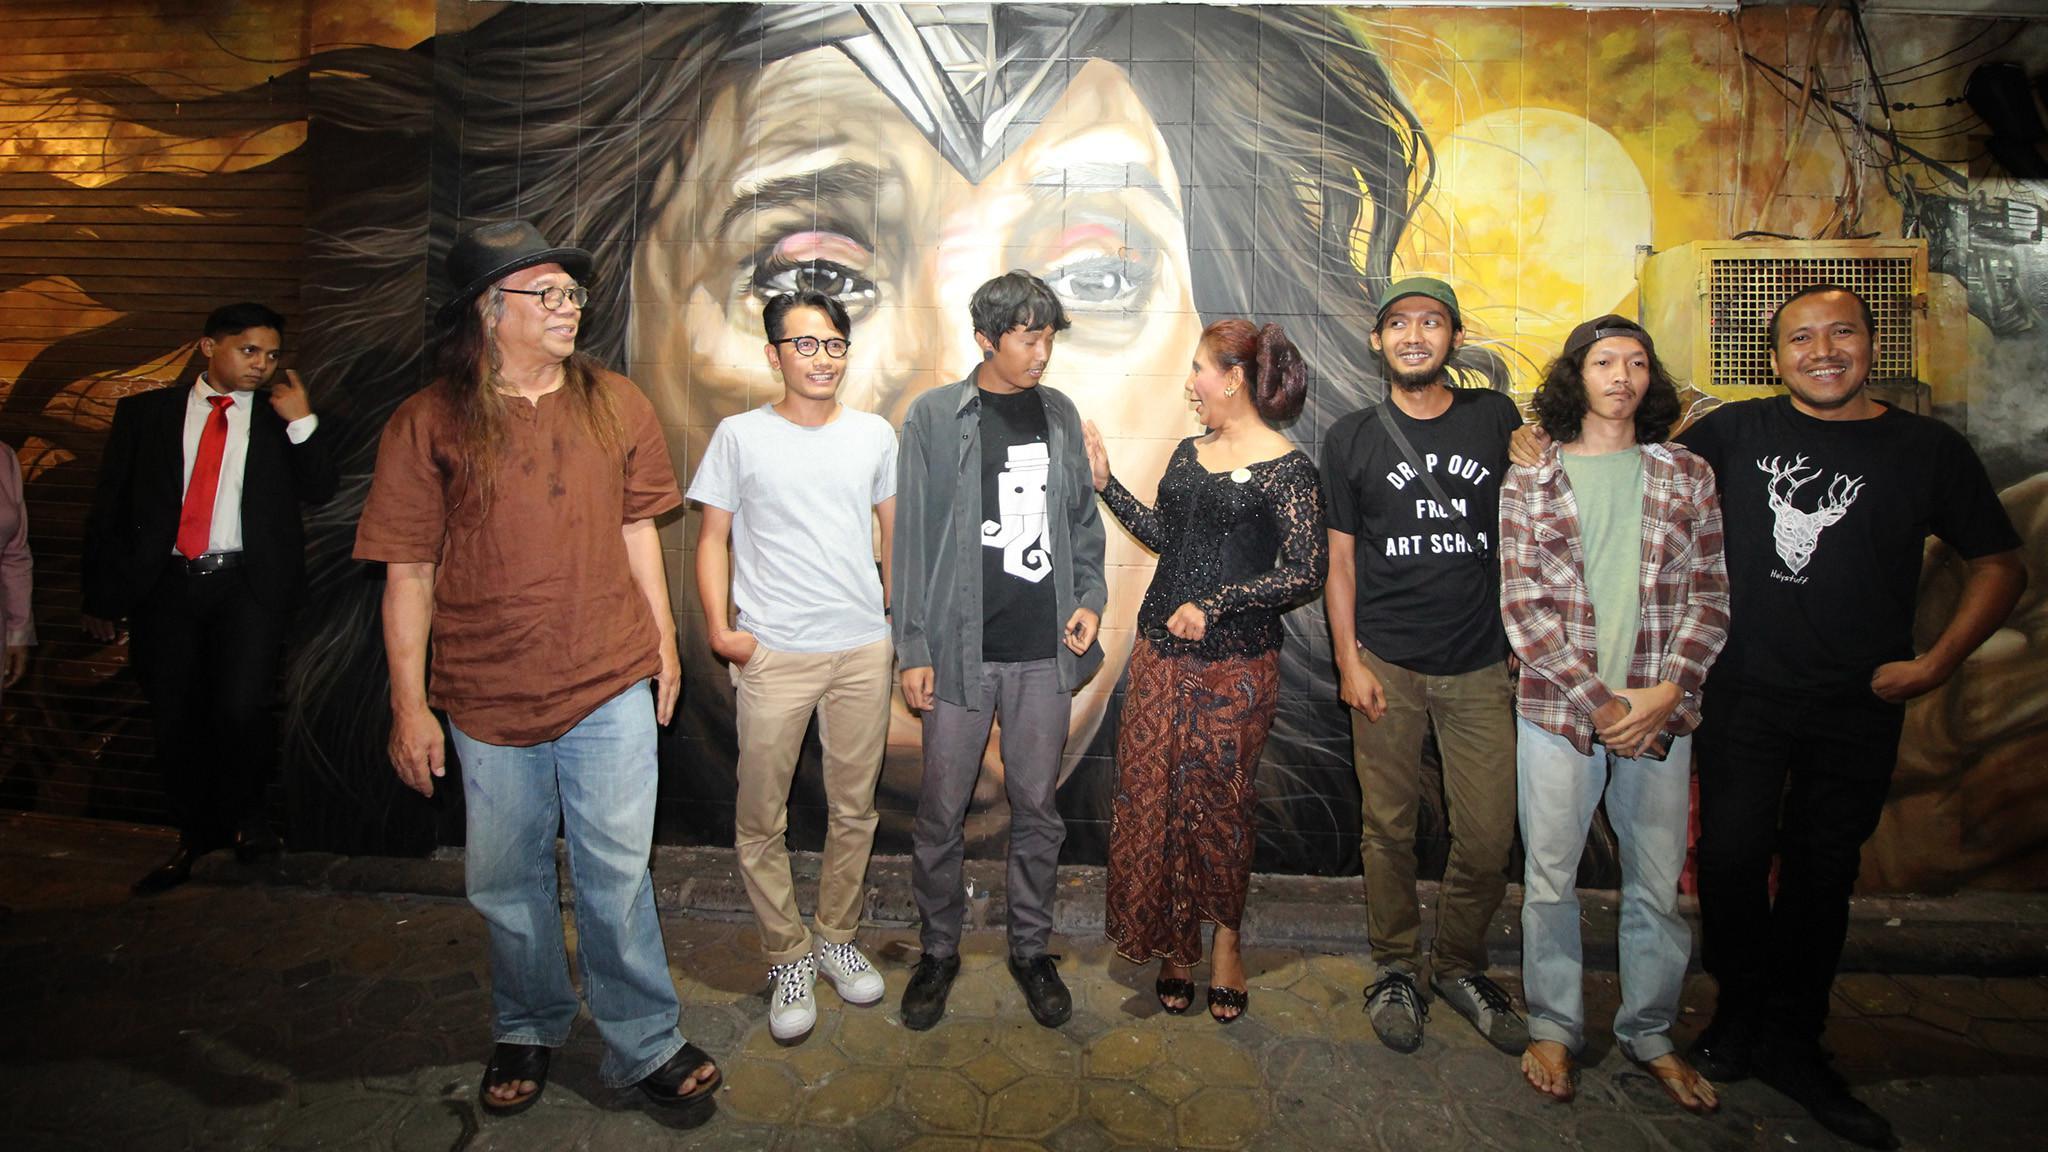 Menteri Susi Pudjiastuti bersama dengan para pelukis yang menggambar Susi Pudjiastuti bak Wonder Woman berpose di depan lukisan